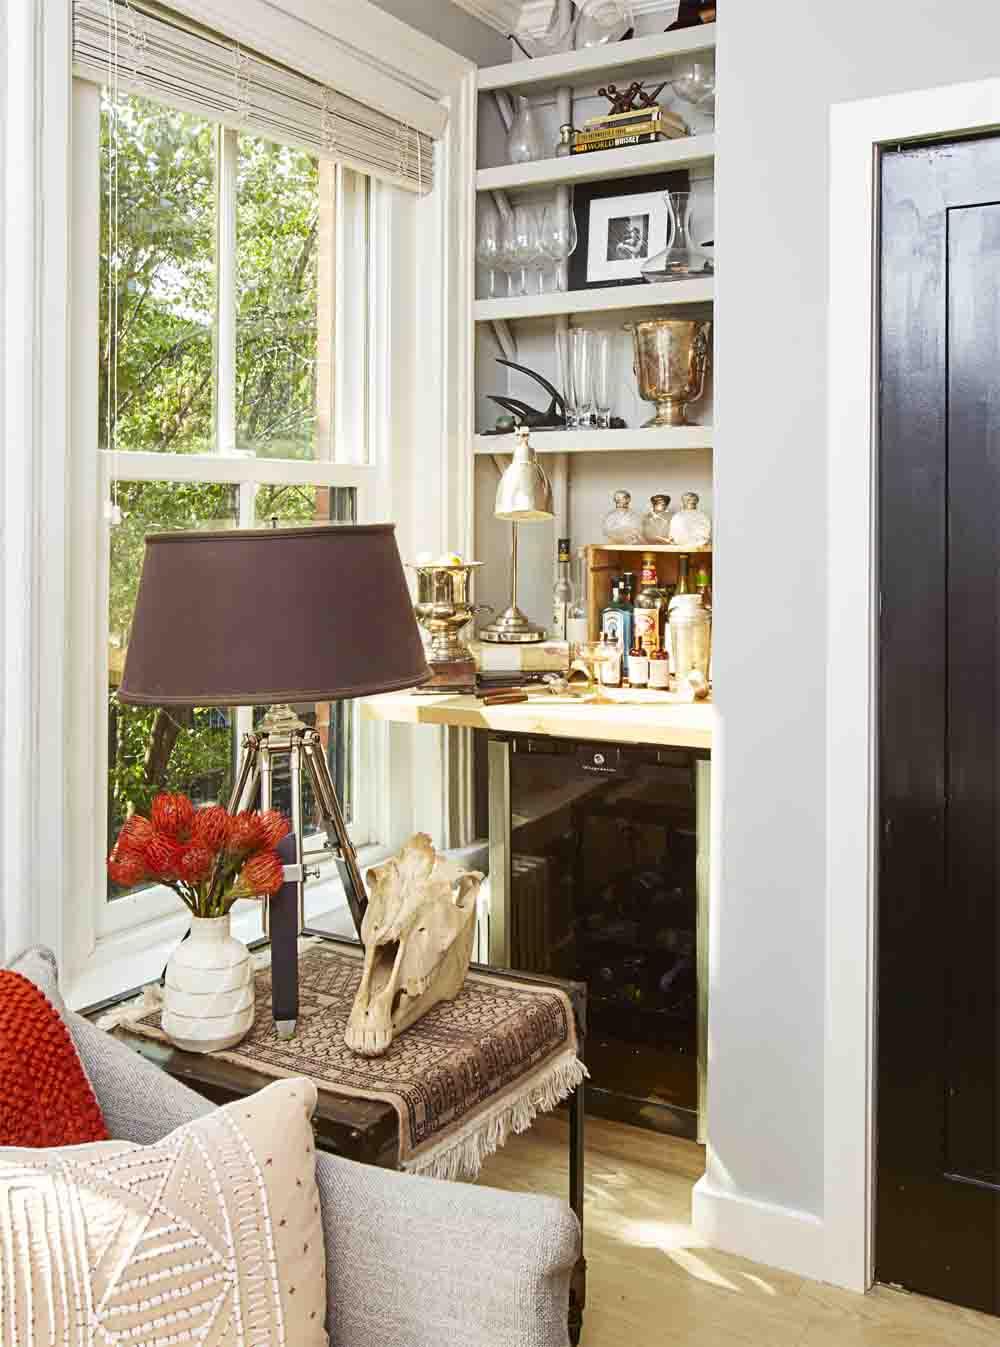 . 15 Family Room Decorating Ideas  Designs   Decor